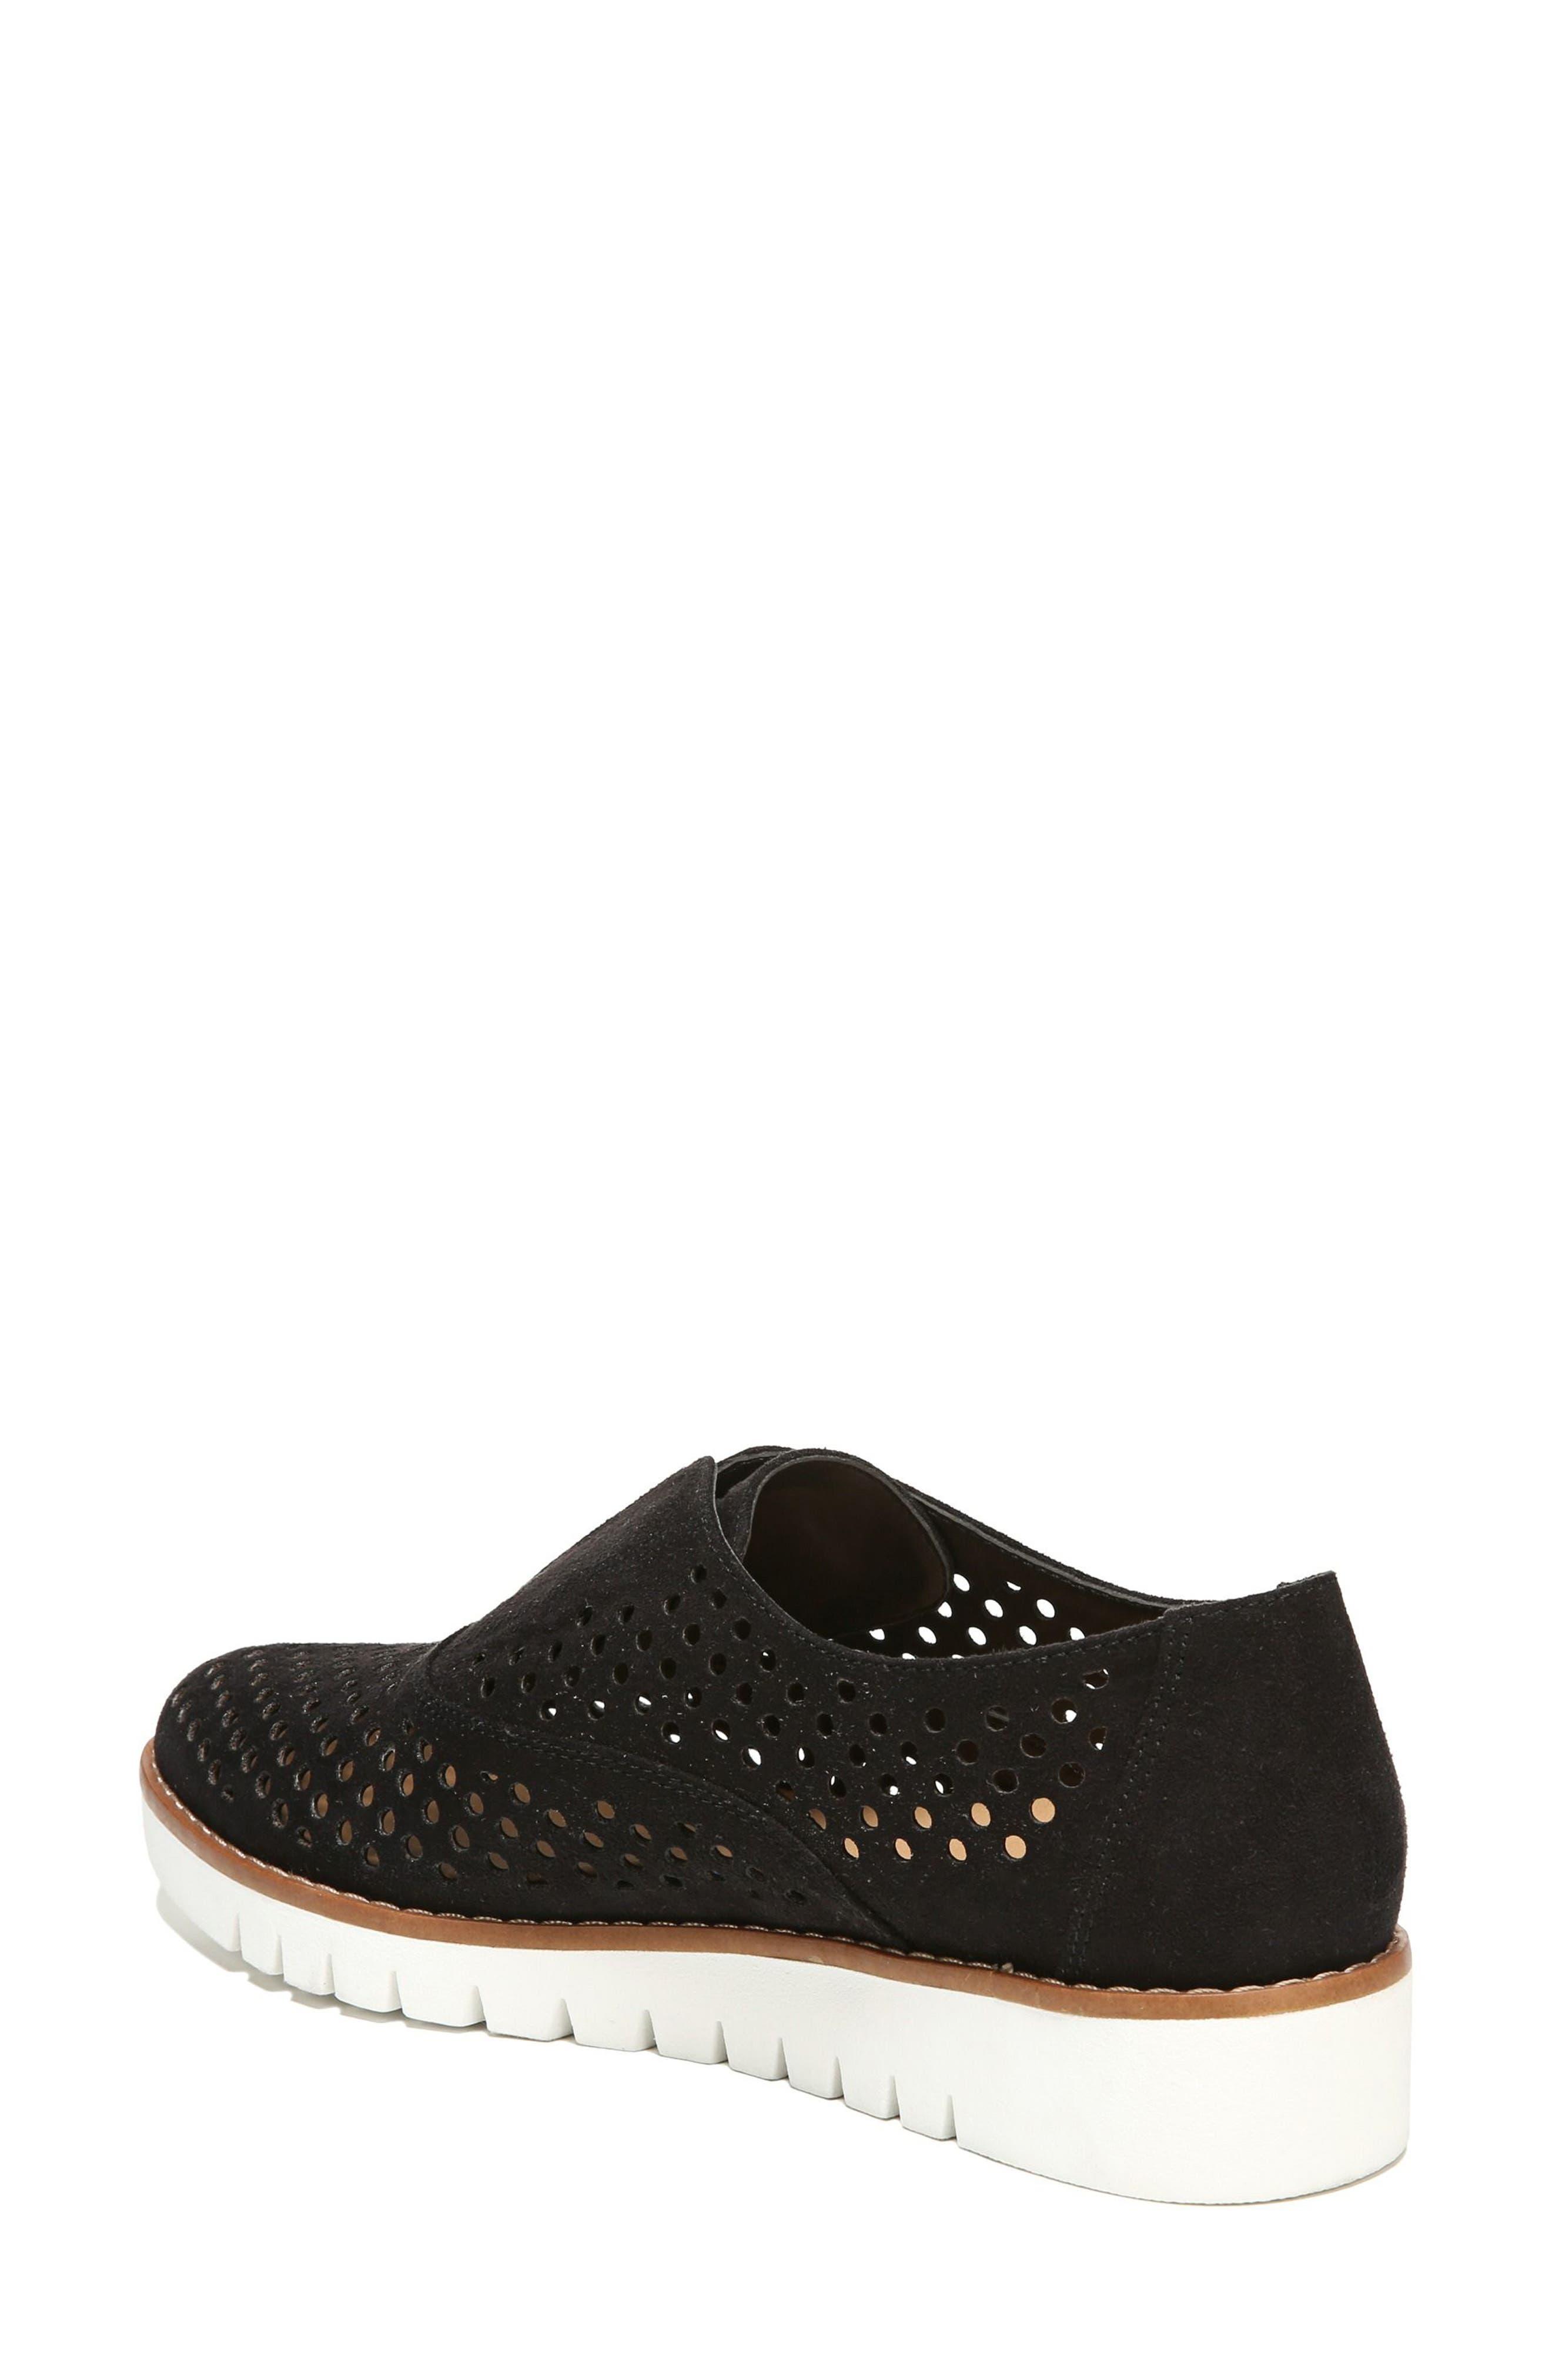 Improve Slip-On Sneaker,                             Alternate thumbnail 2, color,                             BLACK FABRIC